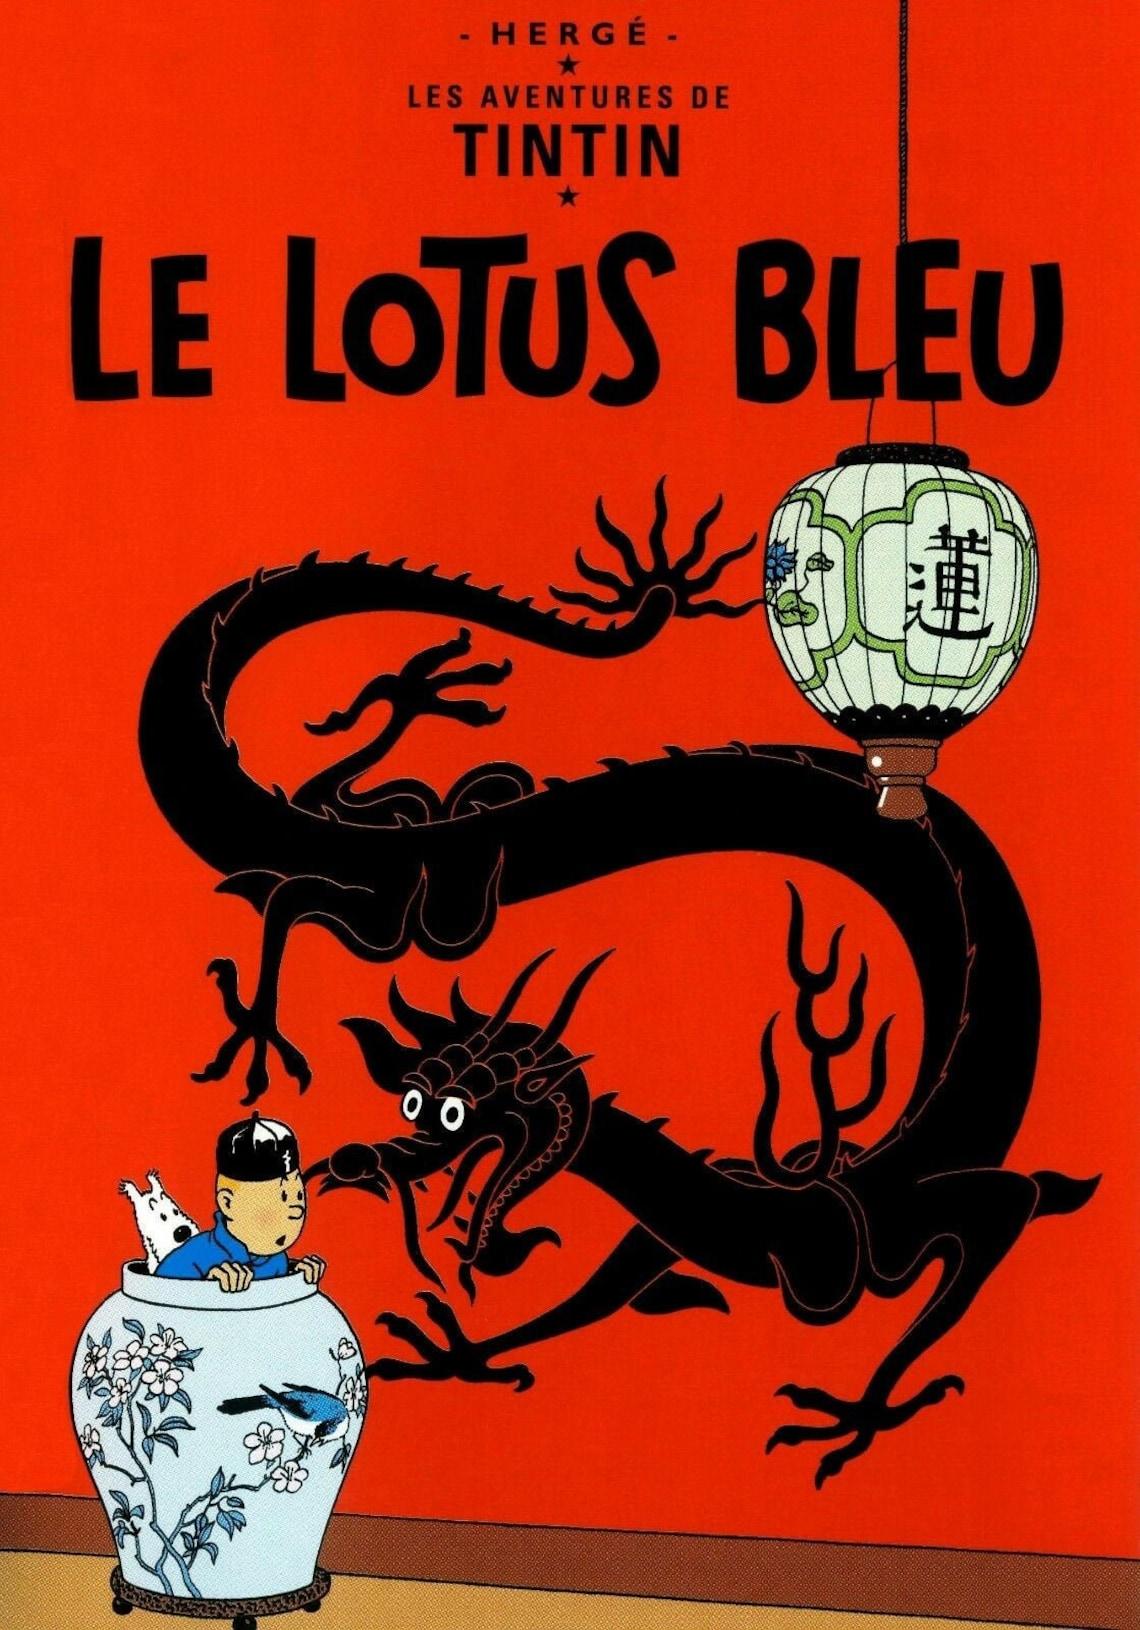 The Adventures of Tintin Le Lotus Bleu 1935 Hergé Poster image 0